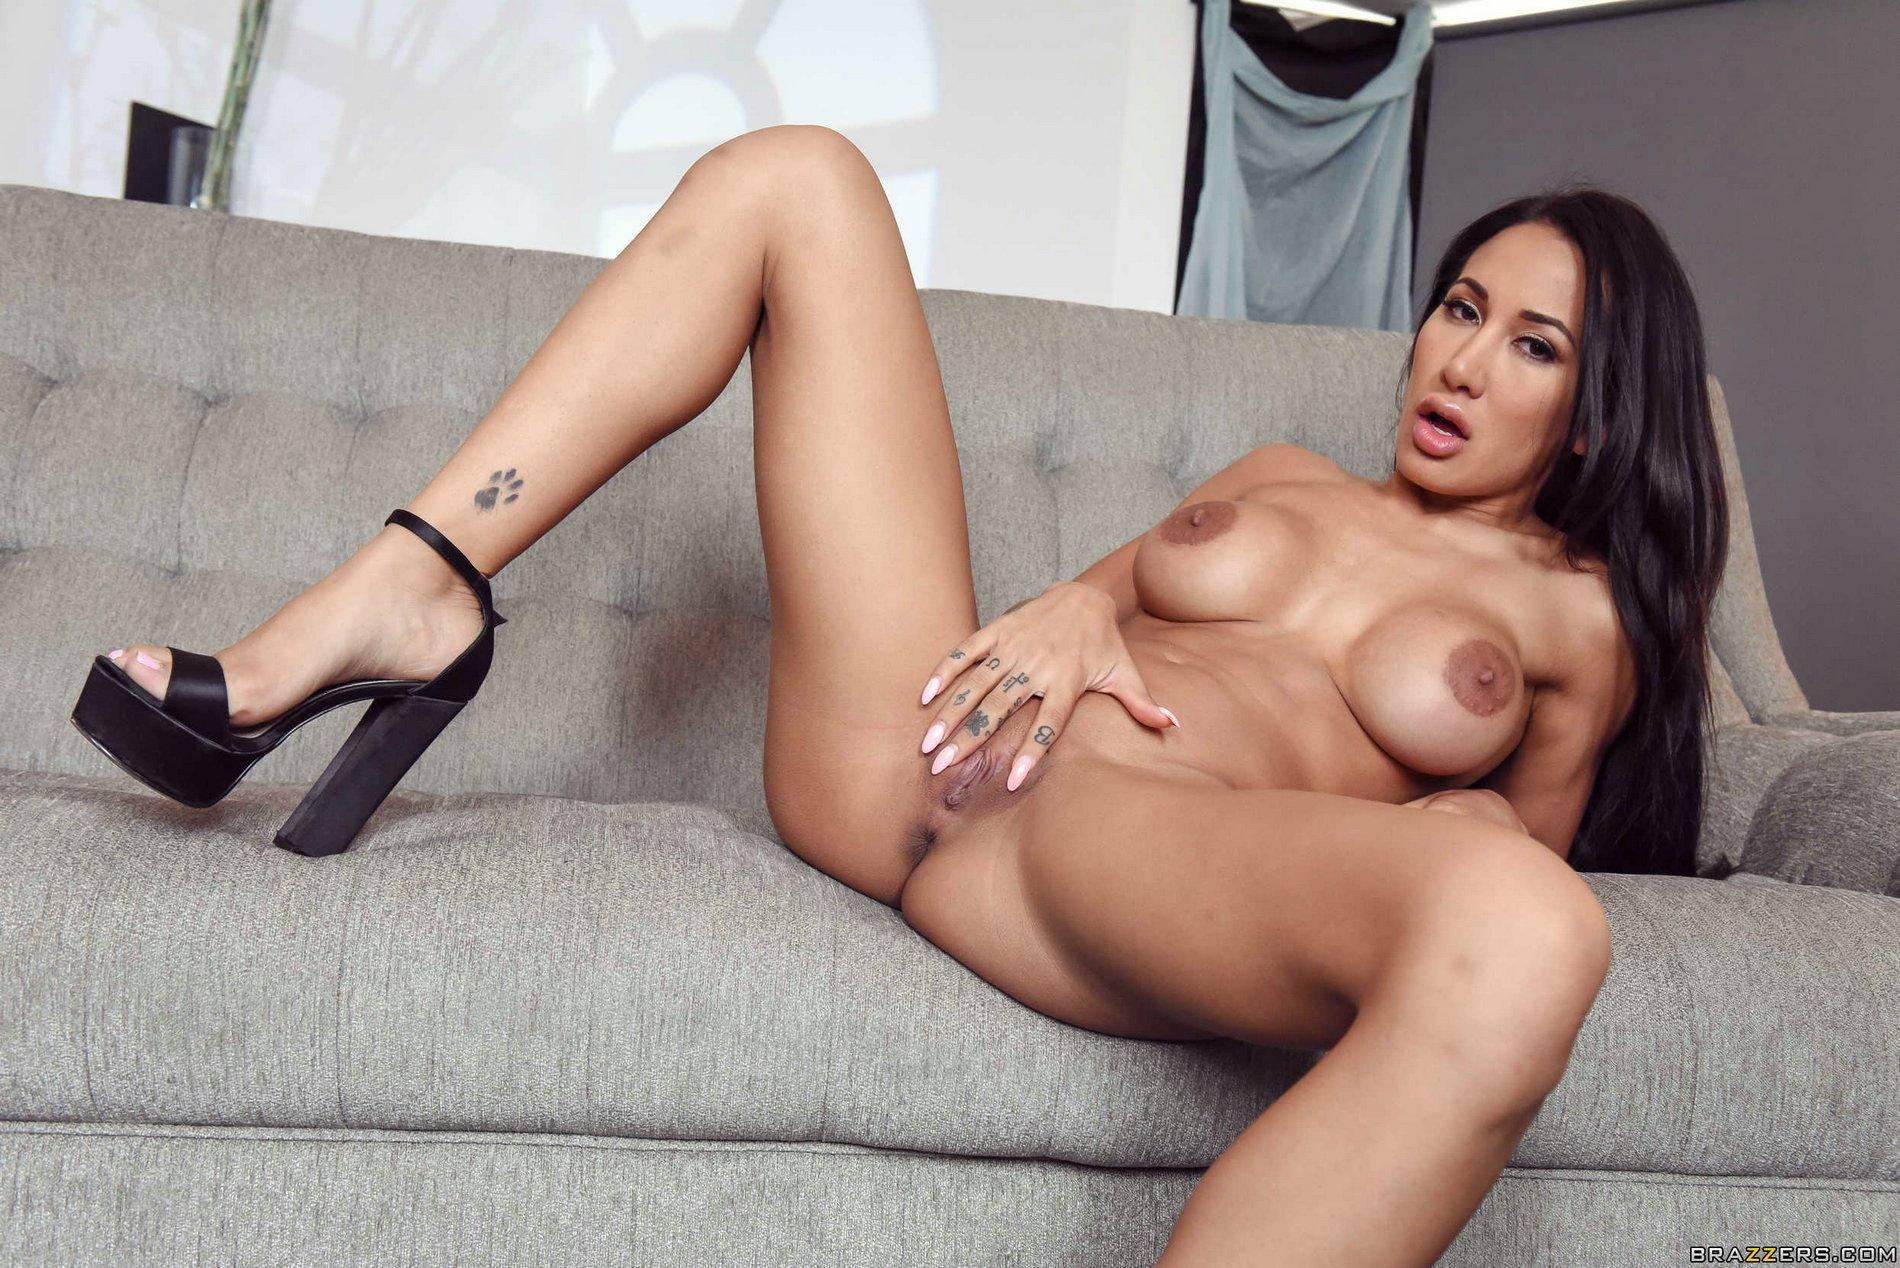 Seems me, Super hot amia porn stars not